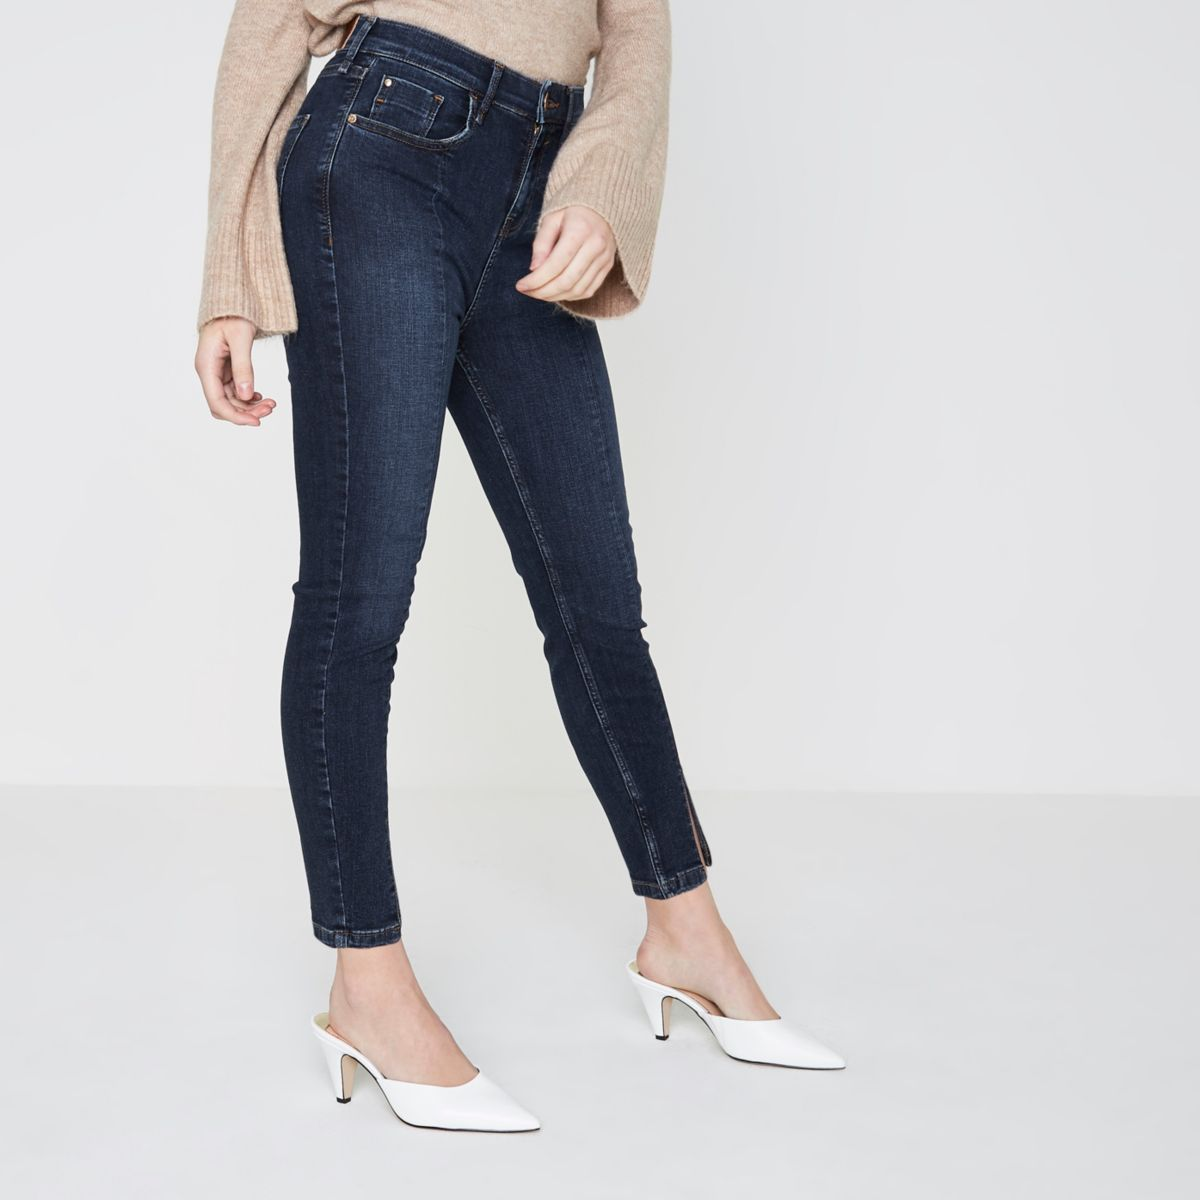 Petite – Amelie – Jean skinny bleu foncé fendu